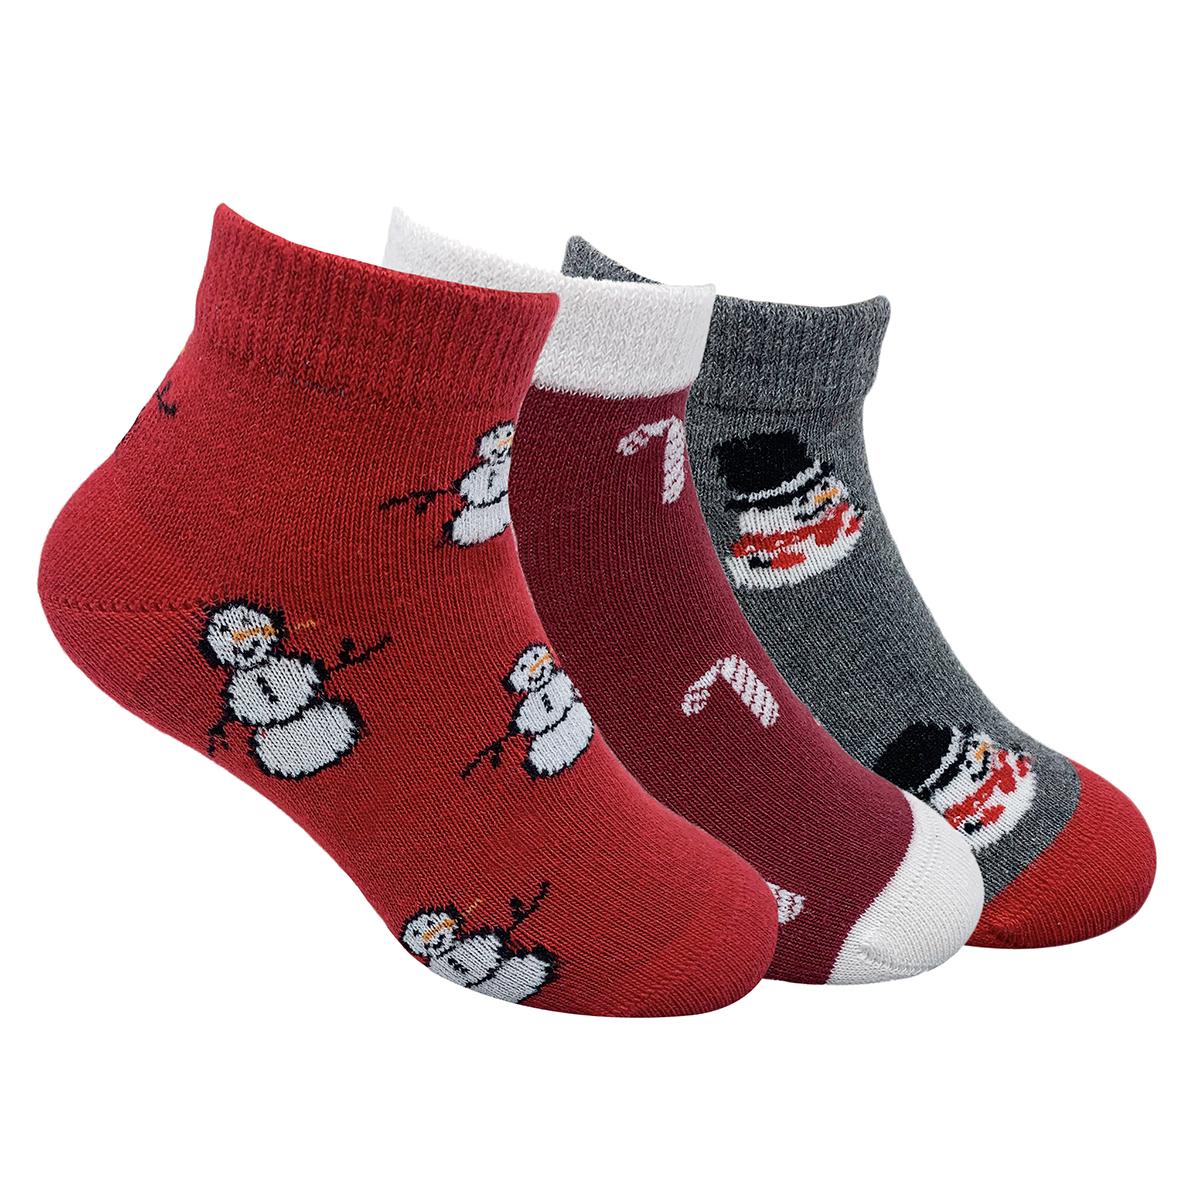 Mint & Oak | Mint & Oak Christmas Around Me Cotton Ankle Length Socks for Kids